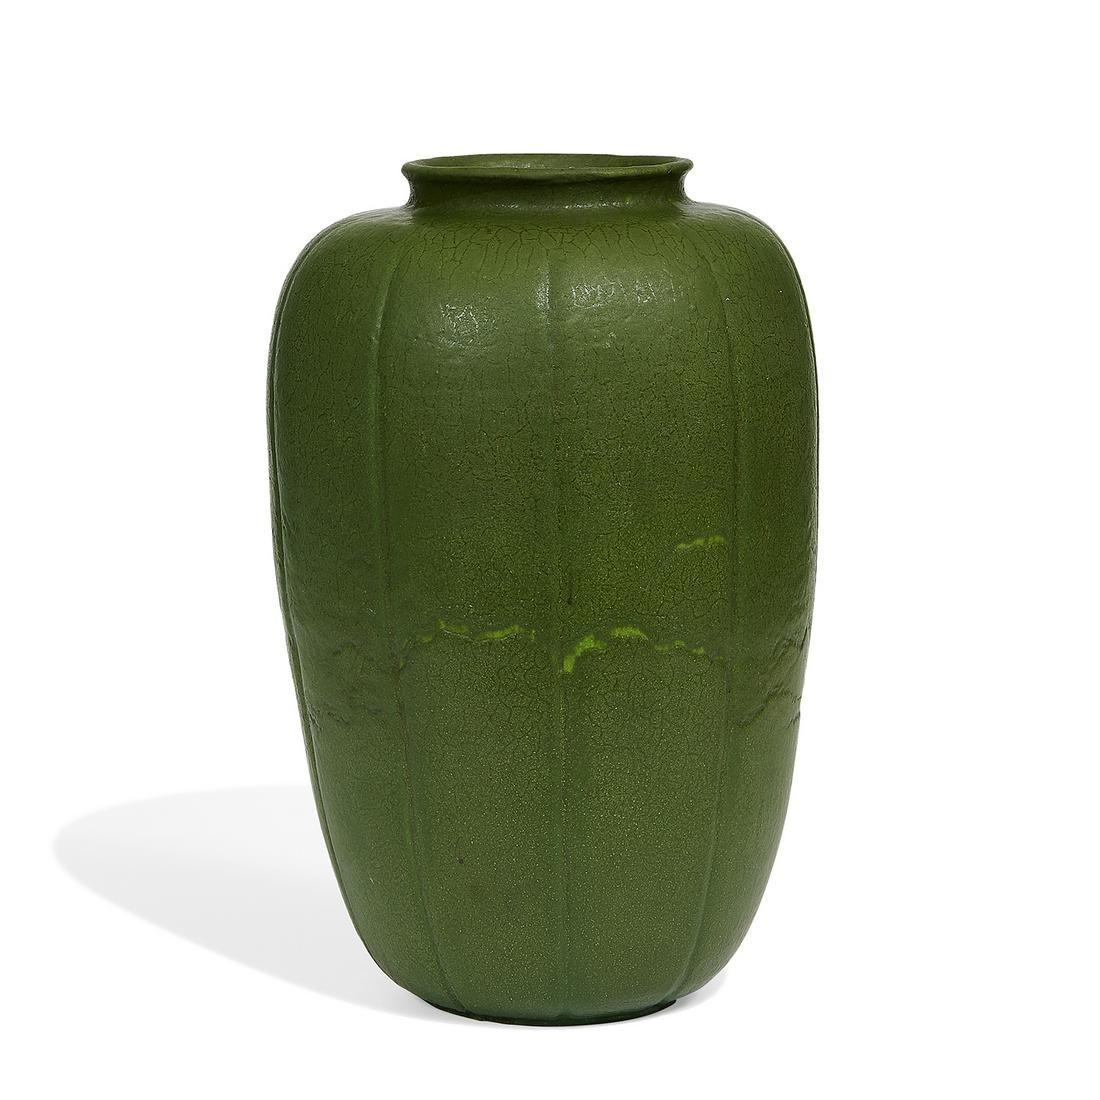 Grueby large vase, shape number 146